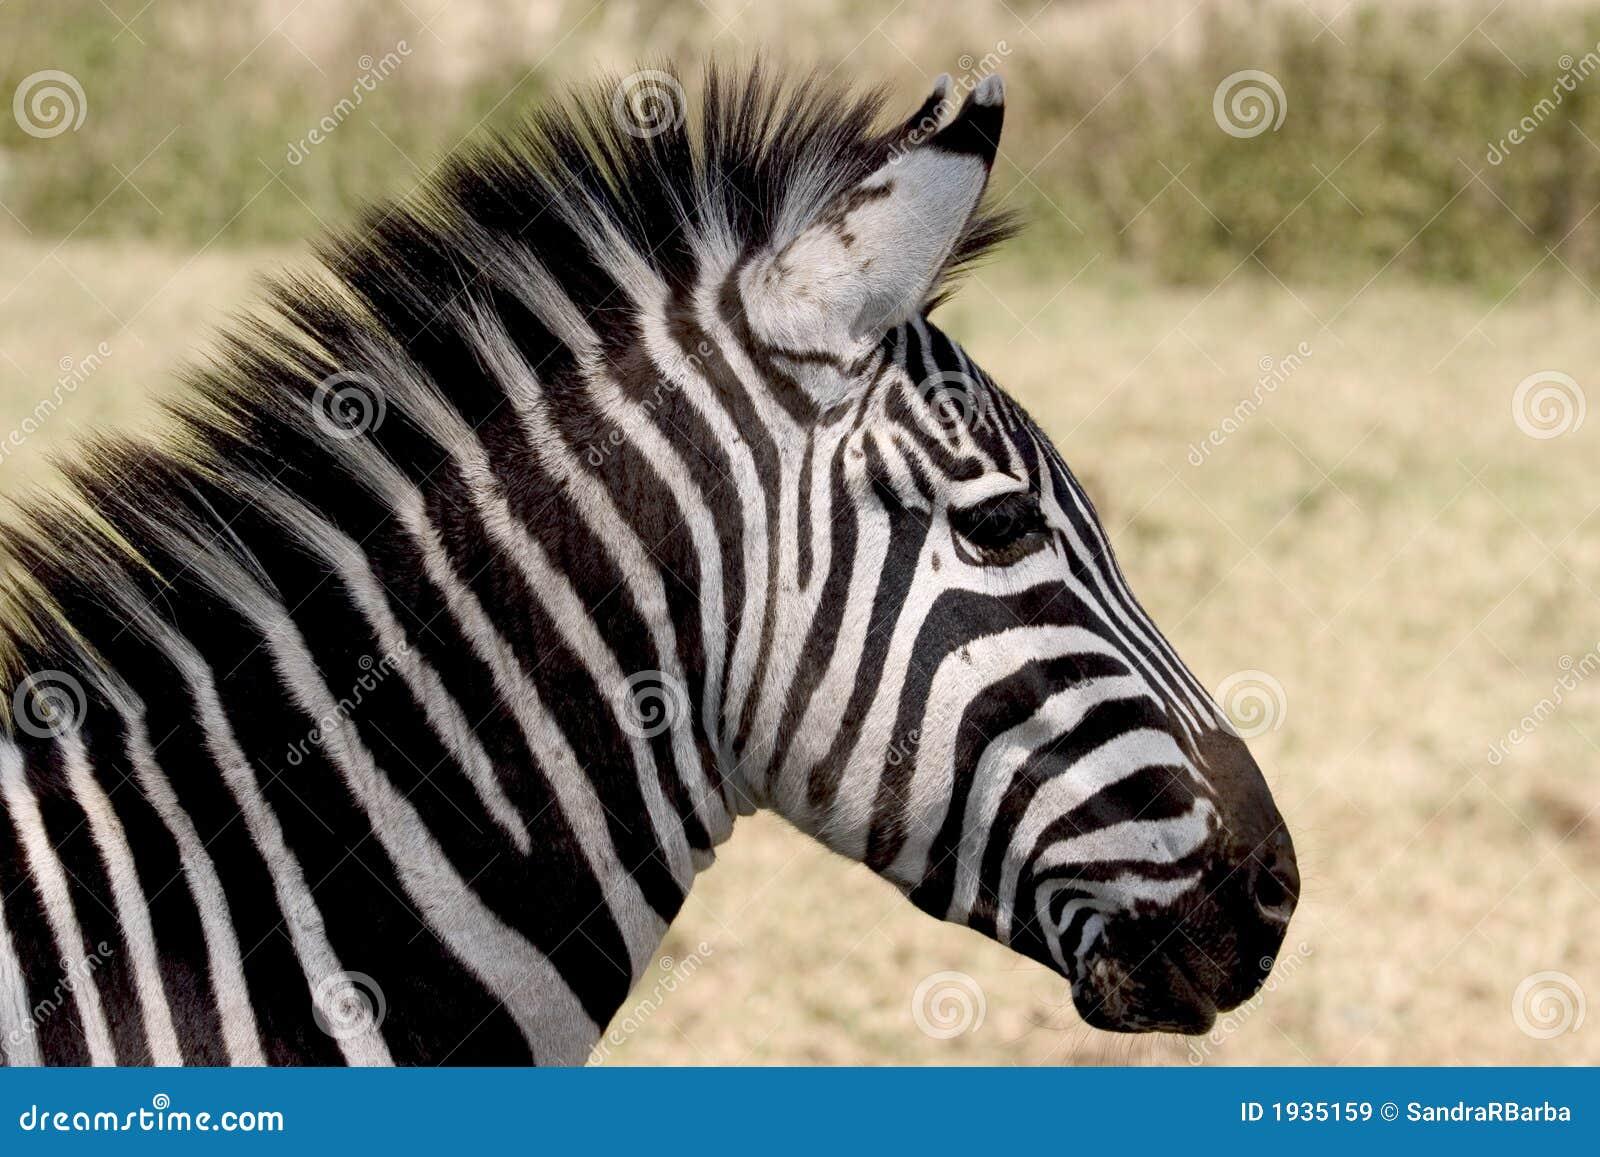 wild dier in afrika  serengeti nationaal park royalty zebra vector art zebra vector tileable